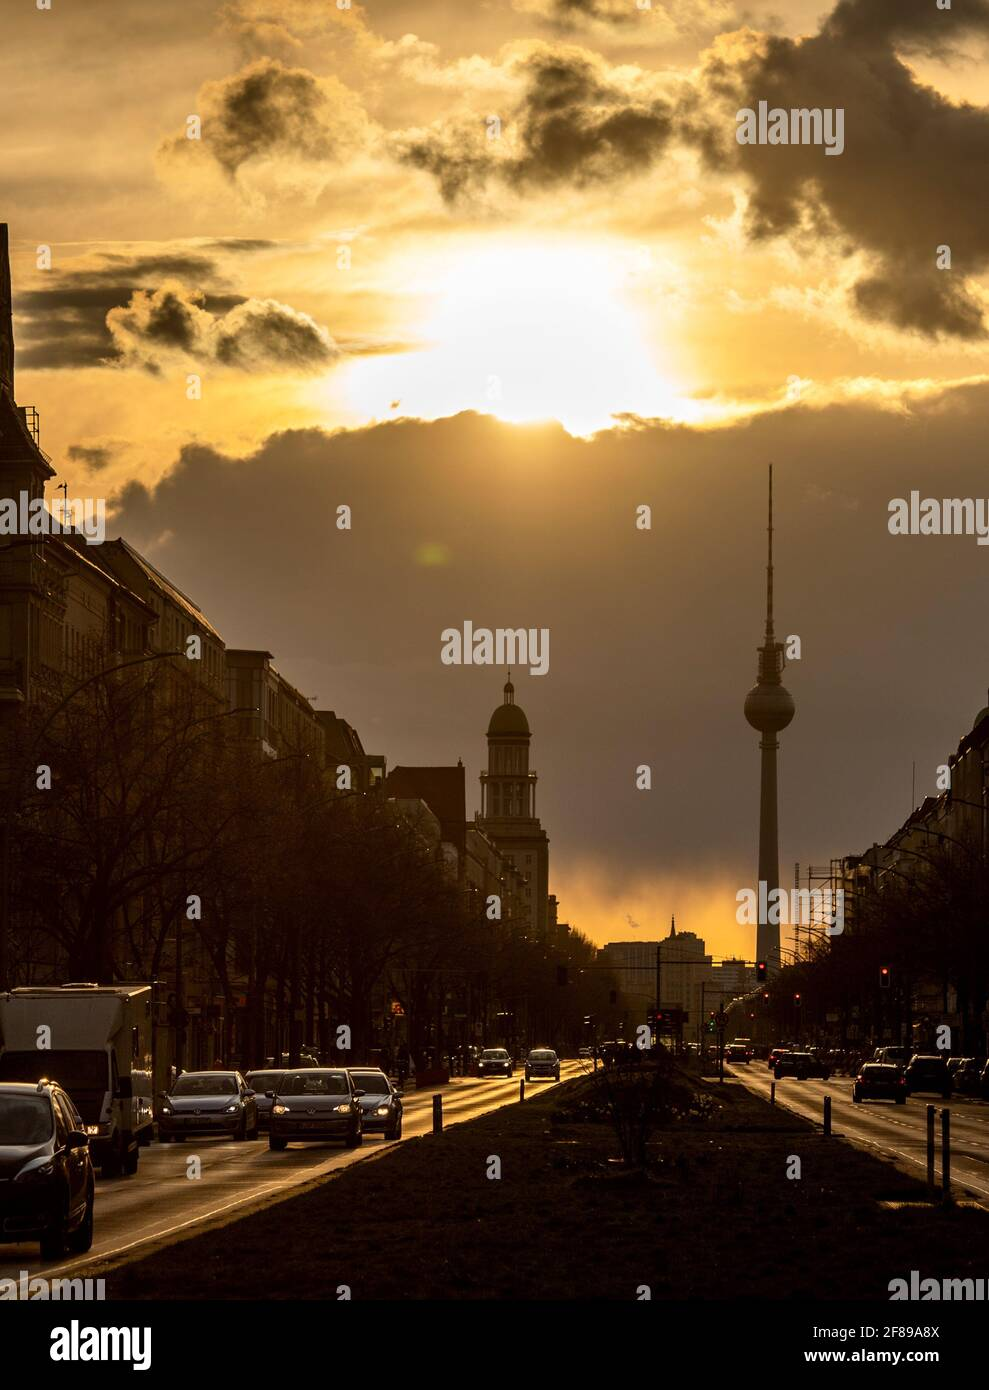 Berlin, Deutschland. April 2021. Bei Sonnenuntergang bewegt sich eine dunkle Wolke hinter dem Fernsehturm. Quelle: Christophe Gateau/dpa/Alamy Live News Stockfoto